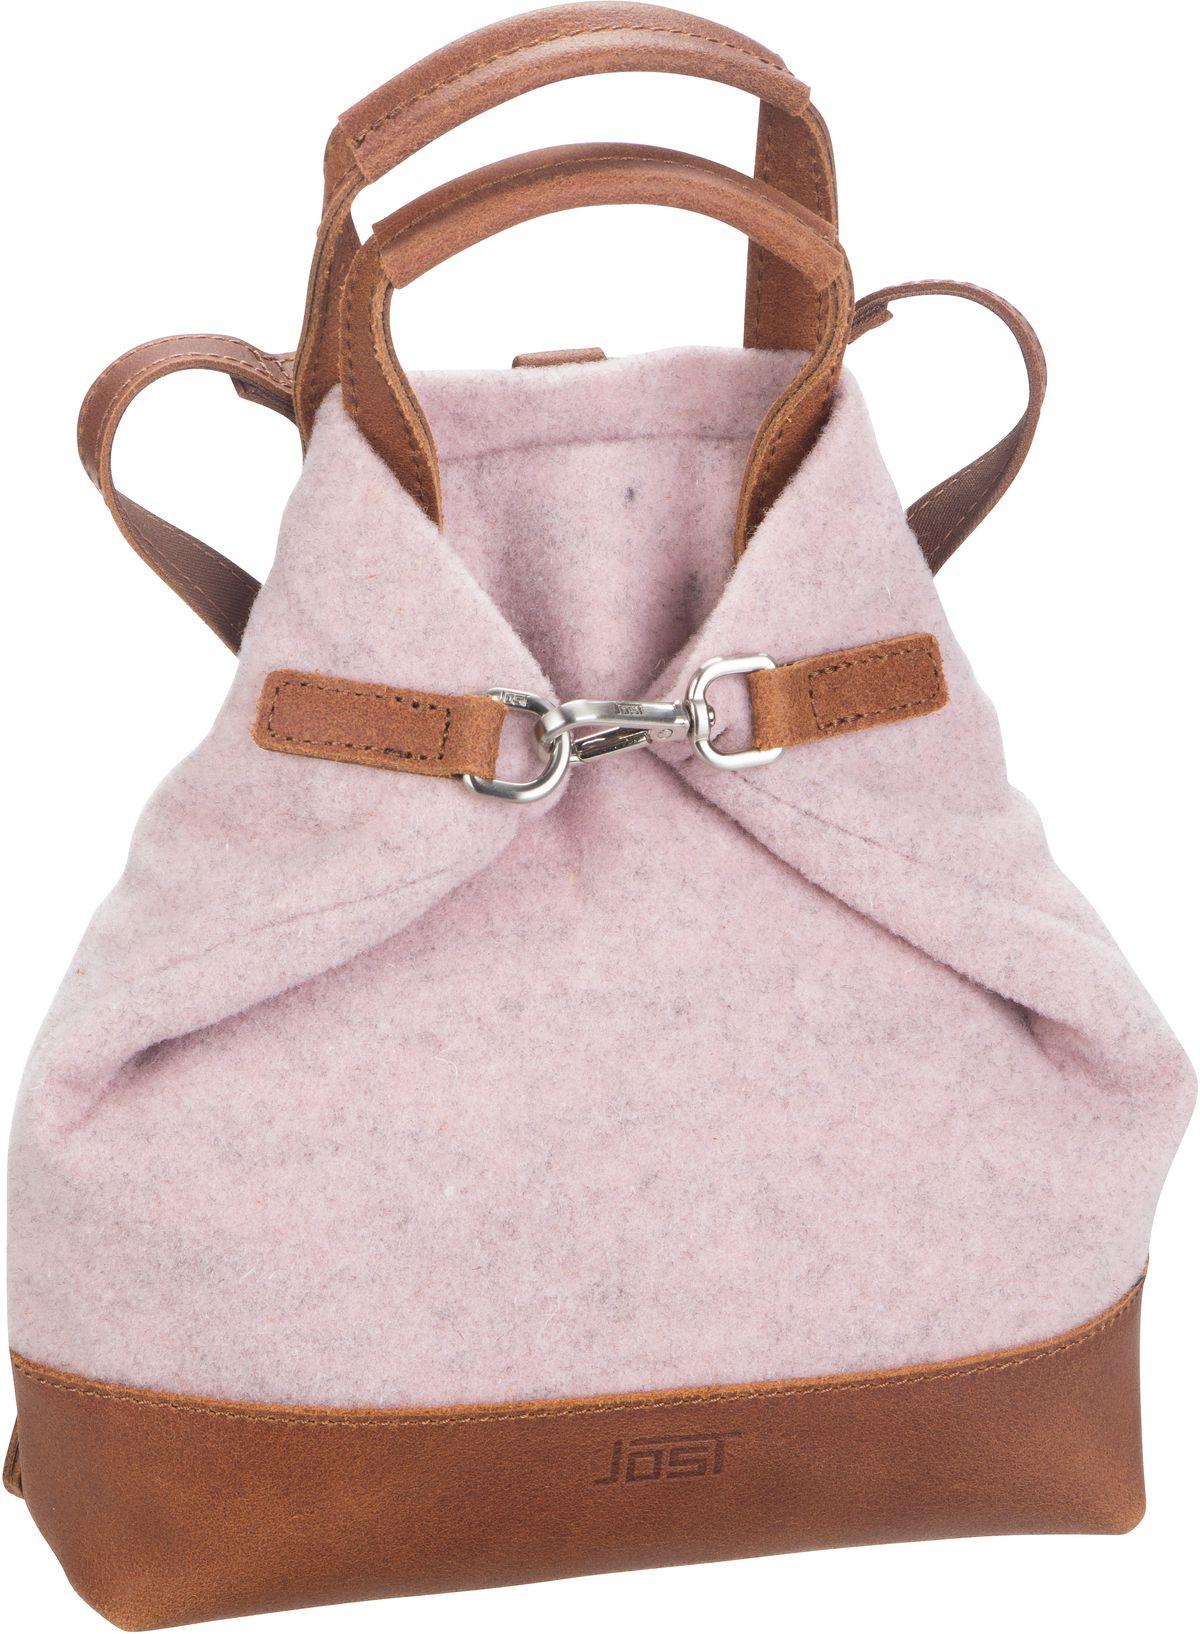 Rucksack / Daypack Farum 3024 X-Change Bag Mini Rosewood